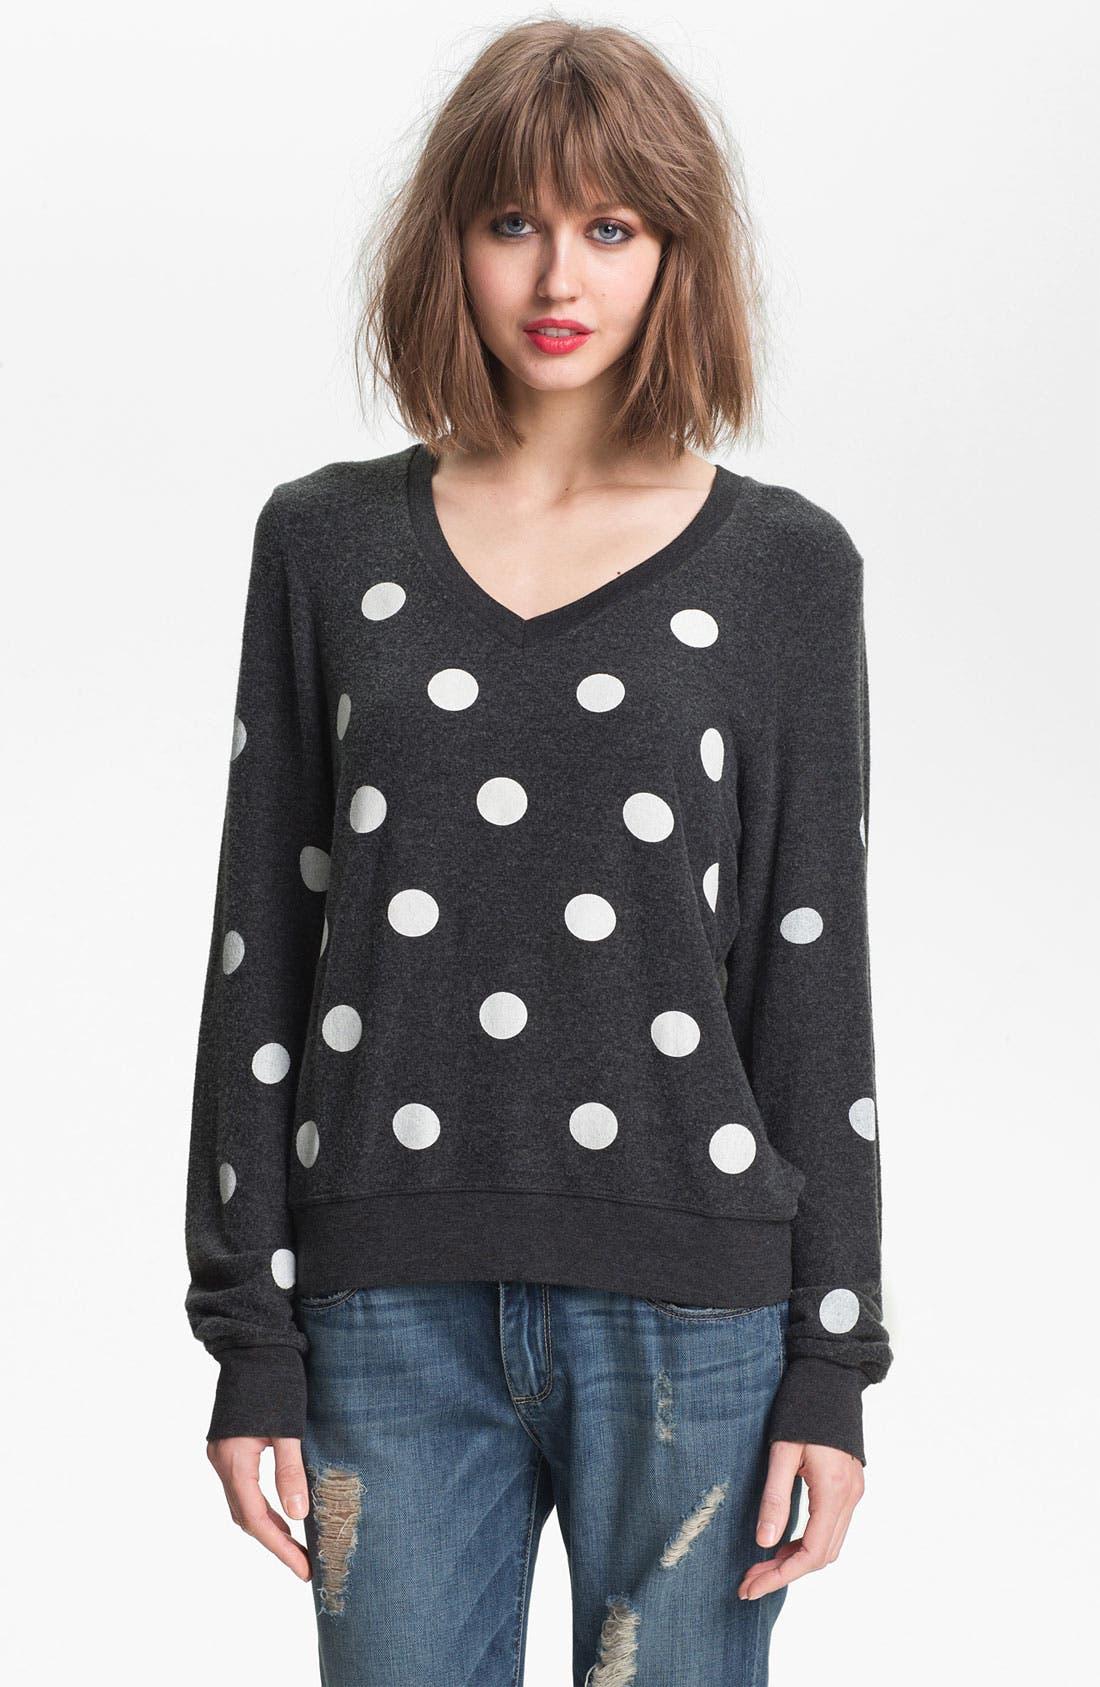 Alternate Image 1 Selected - Wildfox Polka Dot Sweatshirt (Nordstrom Exclusive)